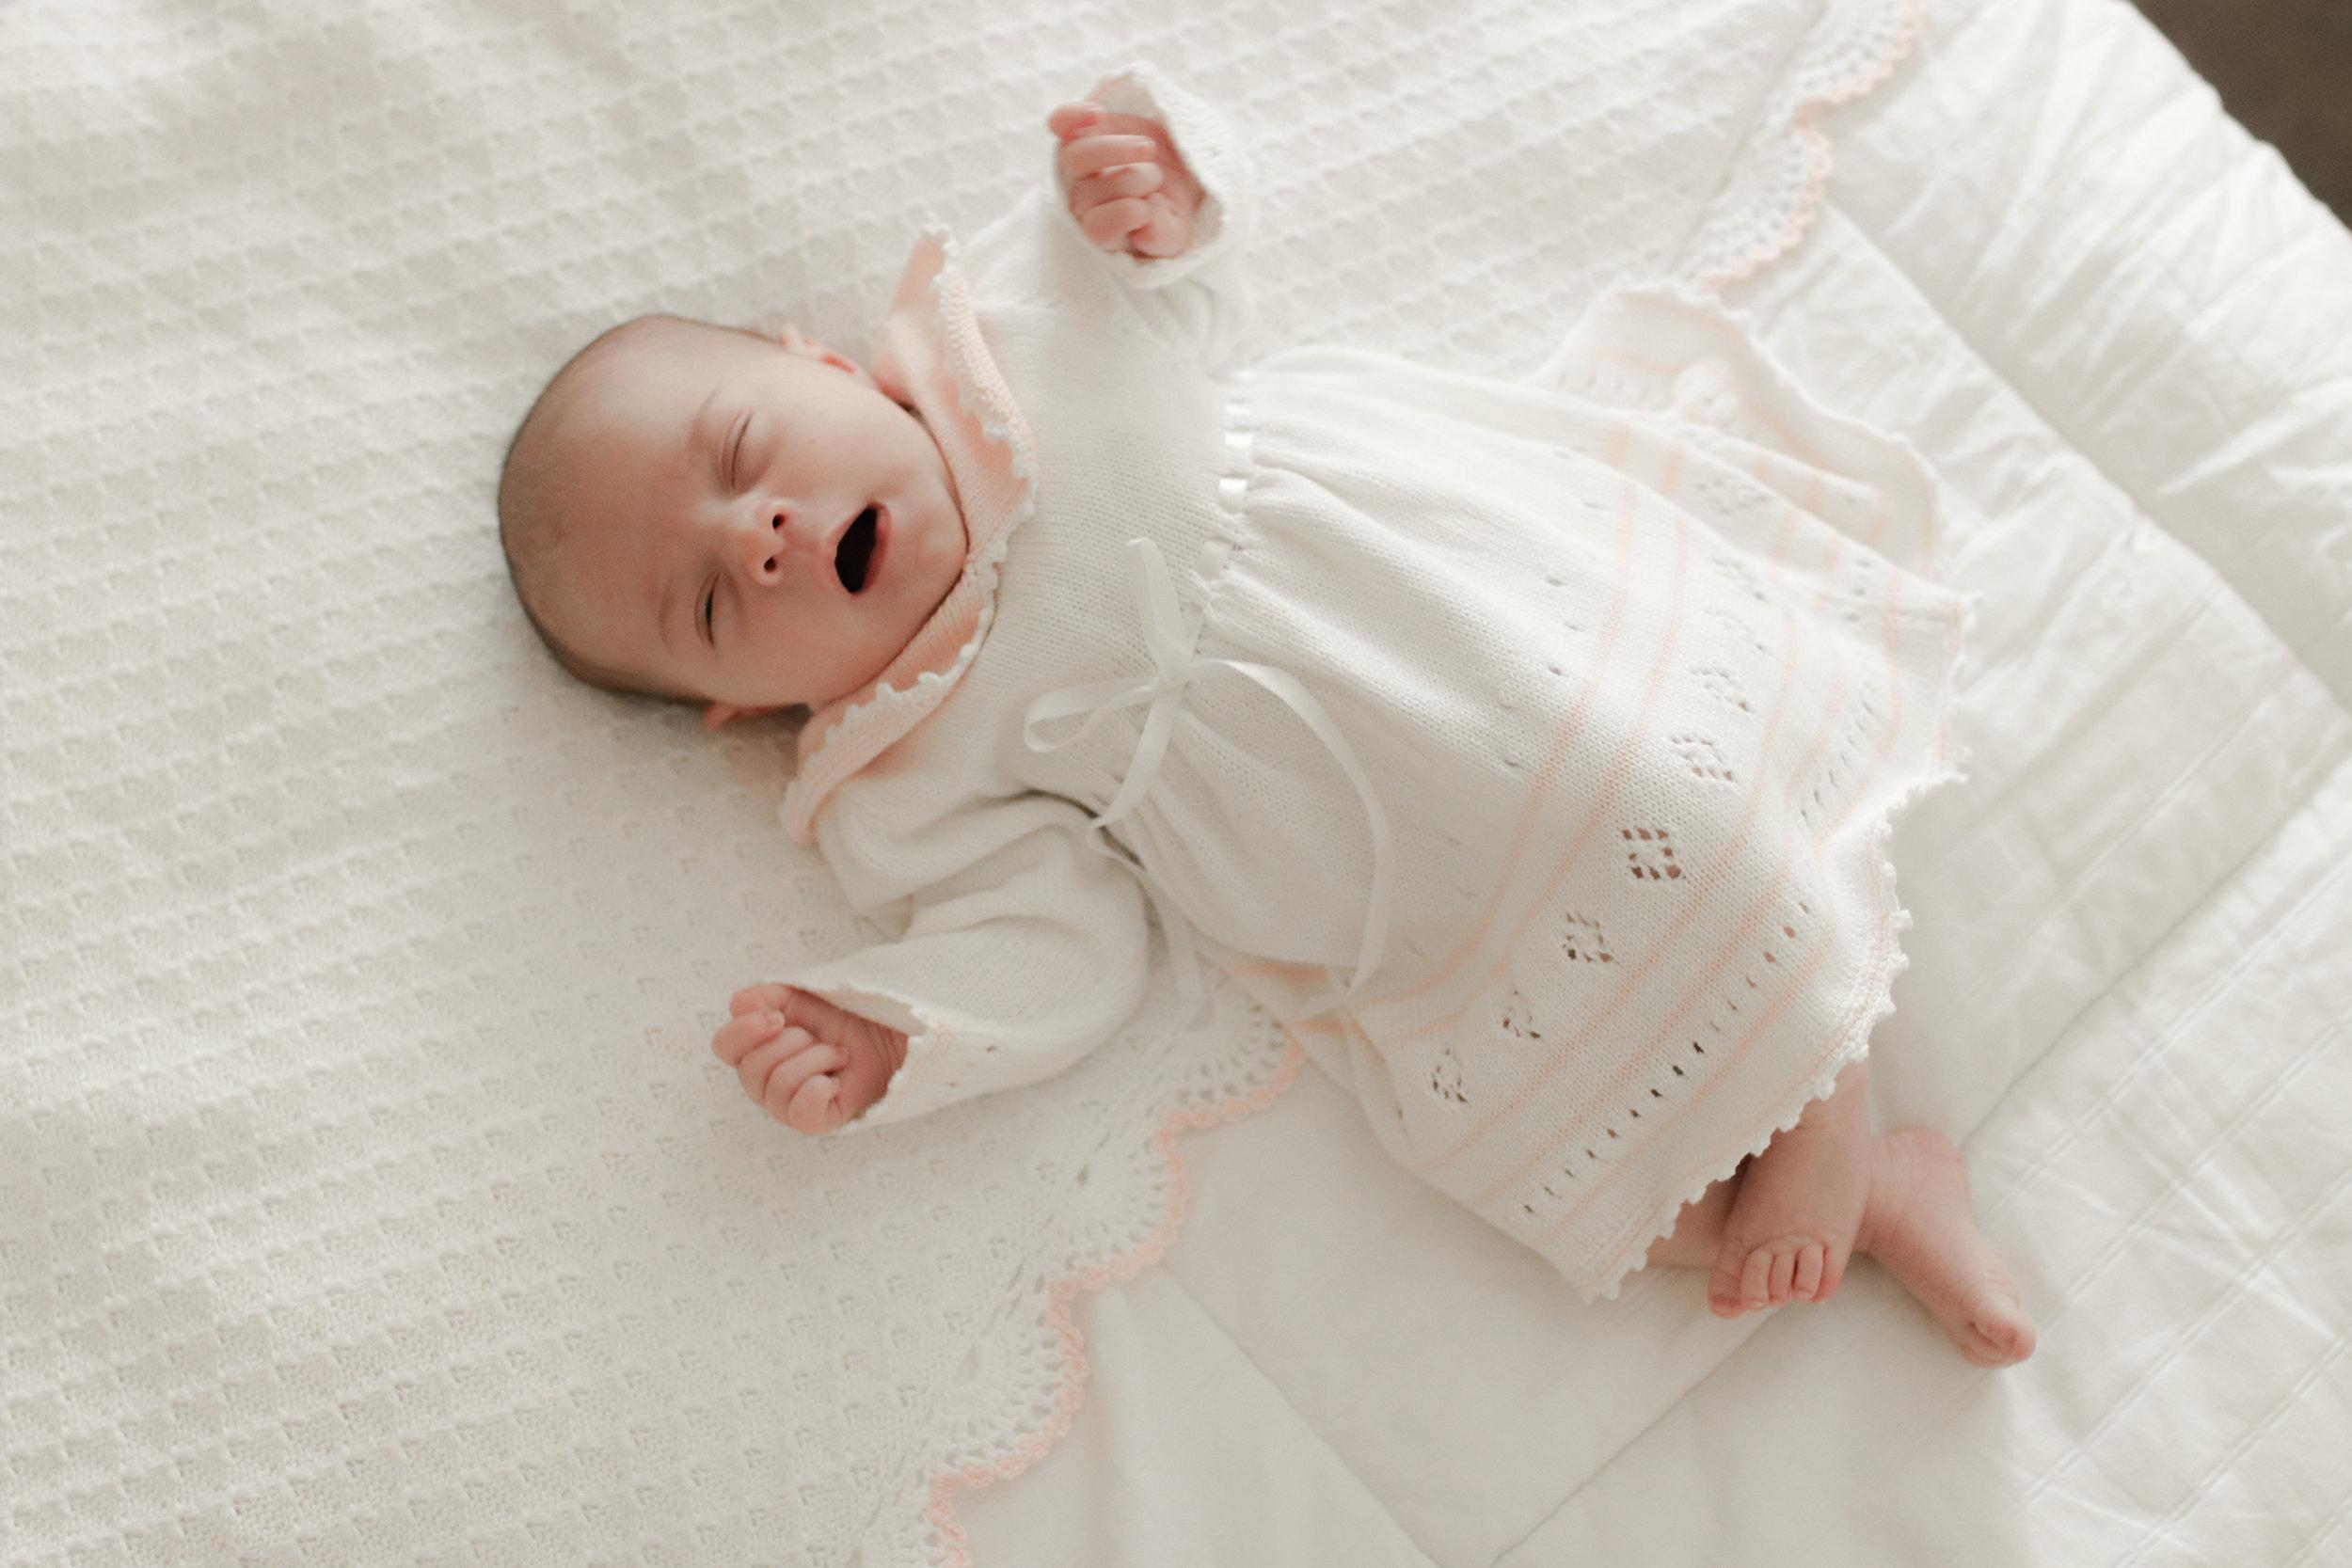 Newborn Lifestyle Family Session | Central Florida Photographer | Melanie Zentmeyer